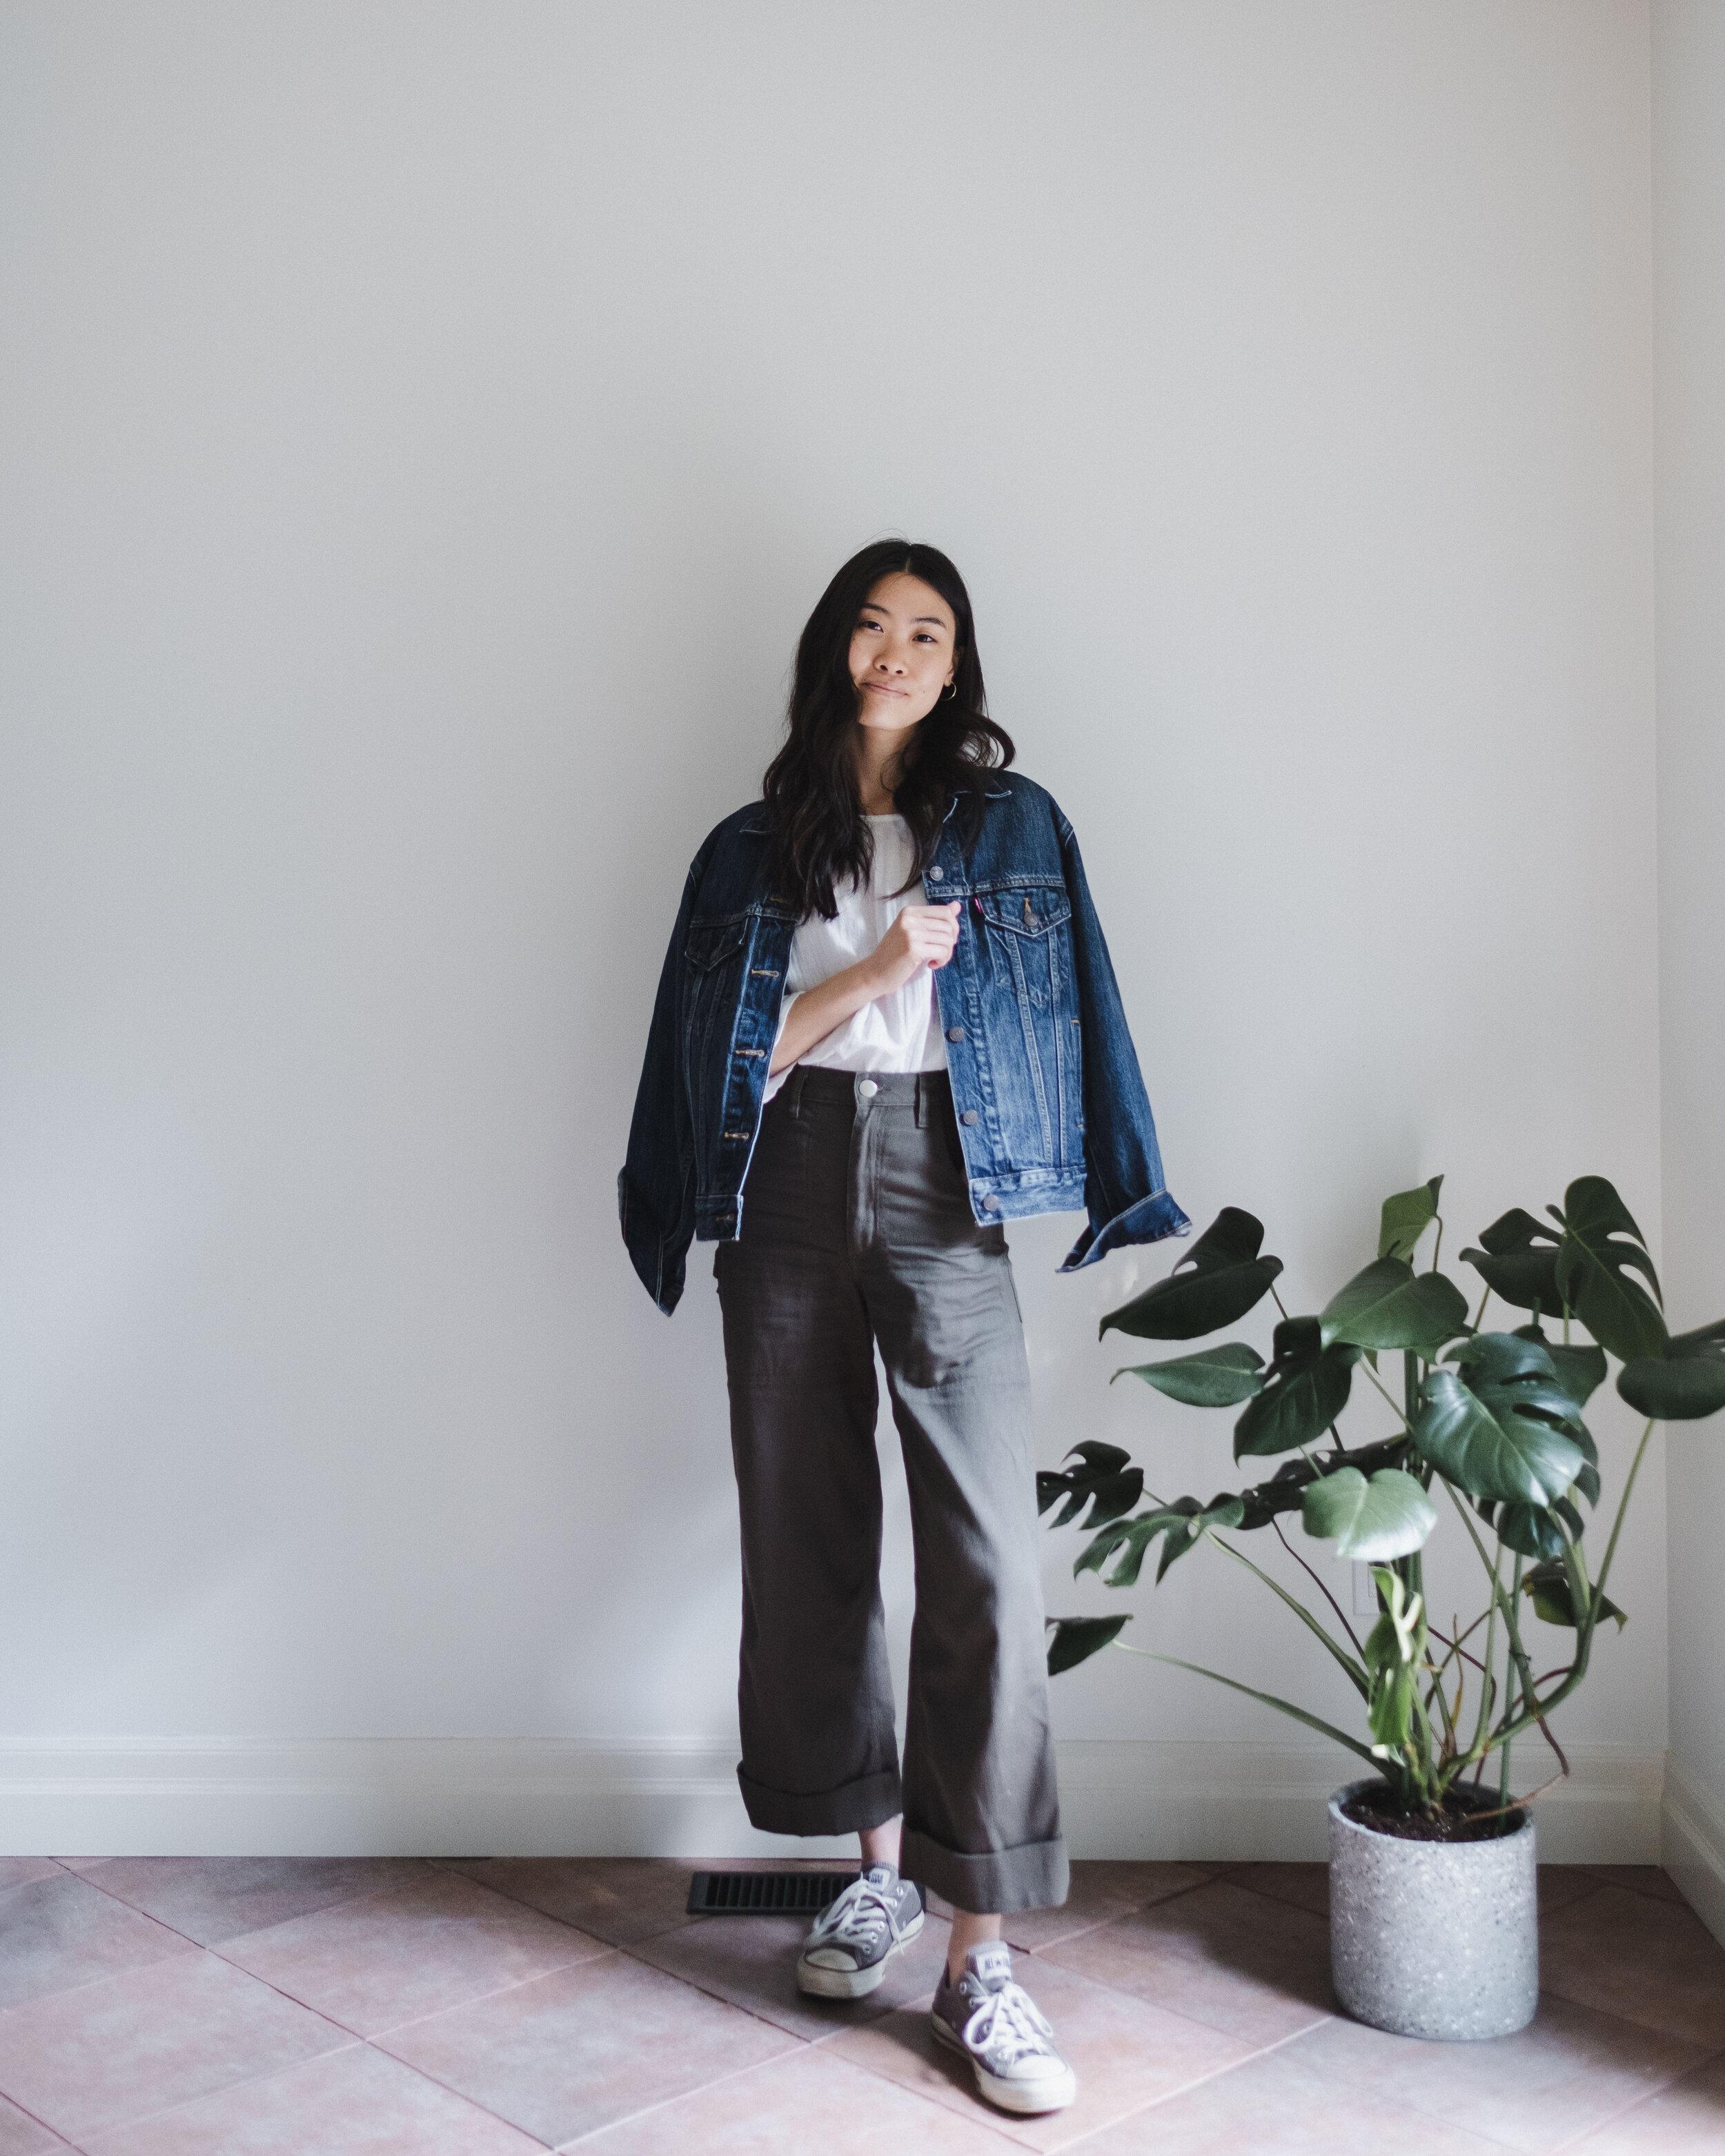 Denim Jacket: Levis     White Top: Voloshin     Painter Pants: Curator SF    Converse